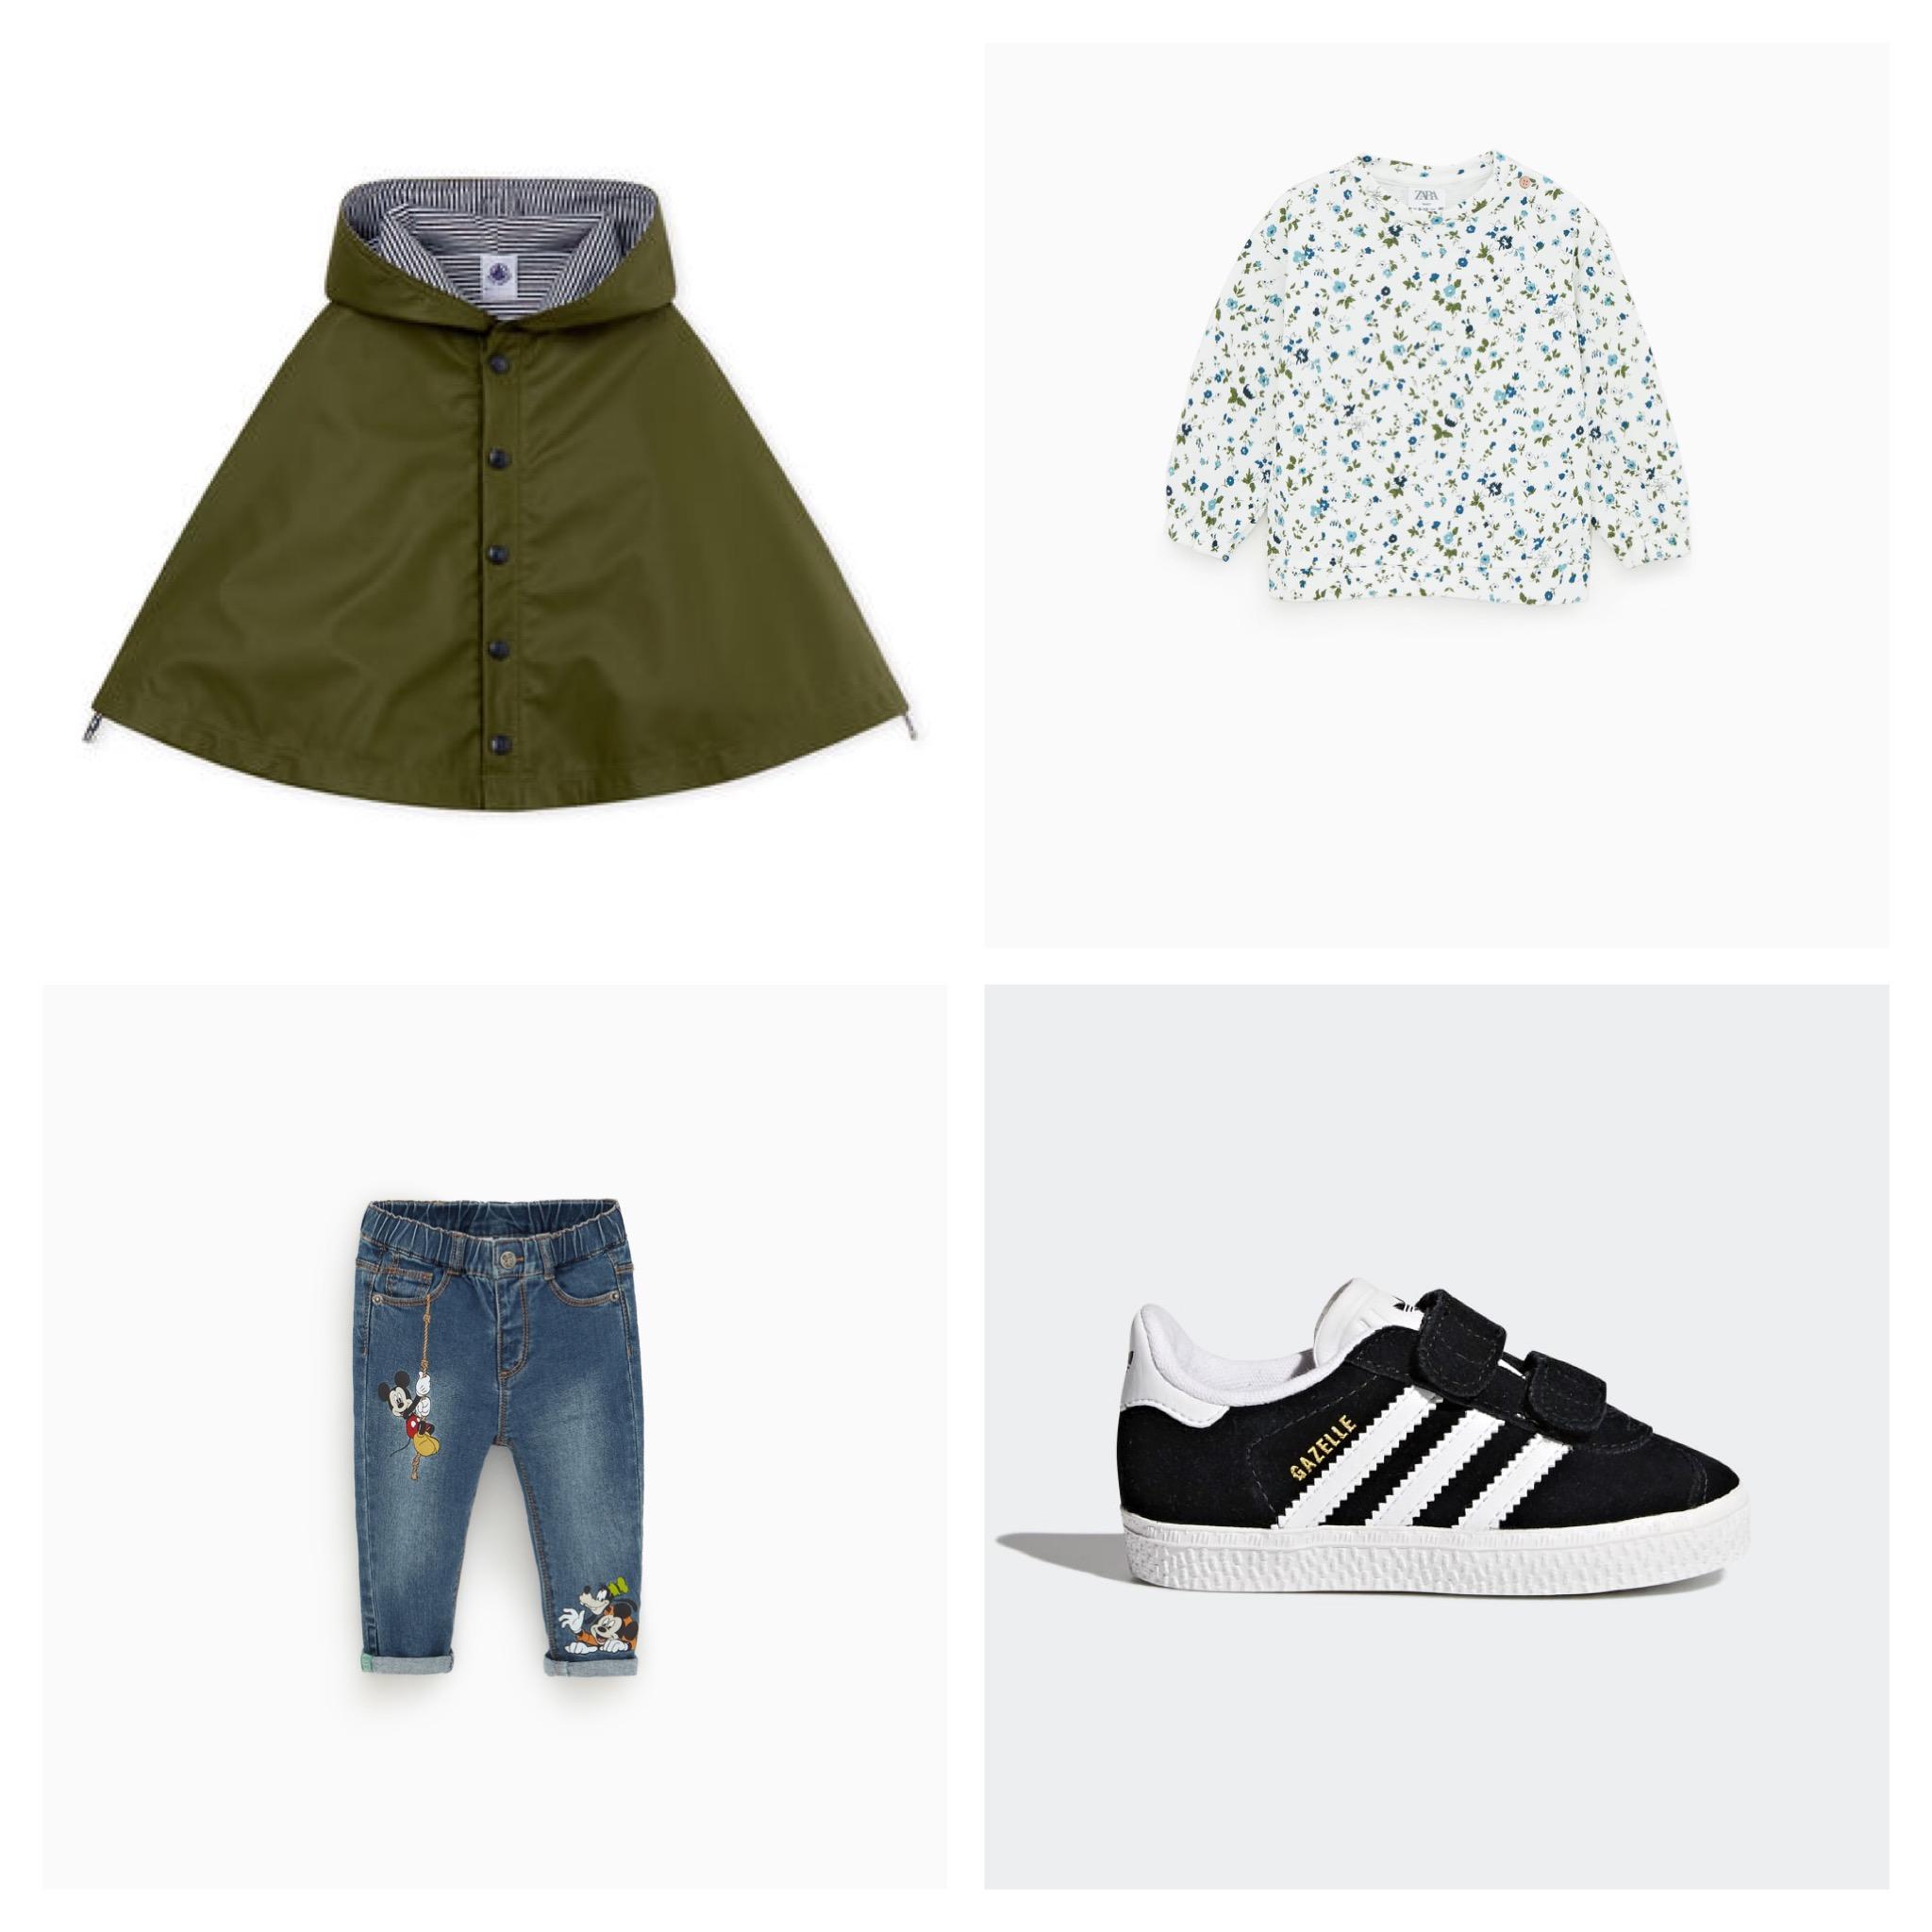 moda bambino primavera 2019